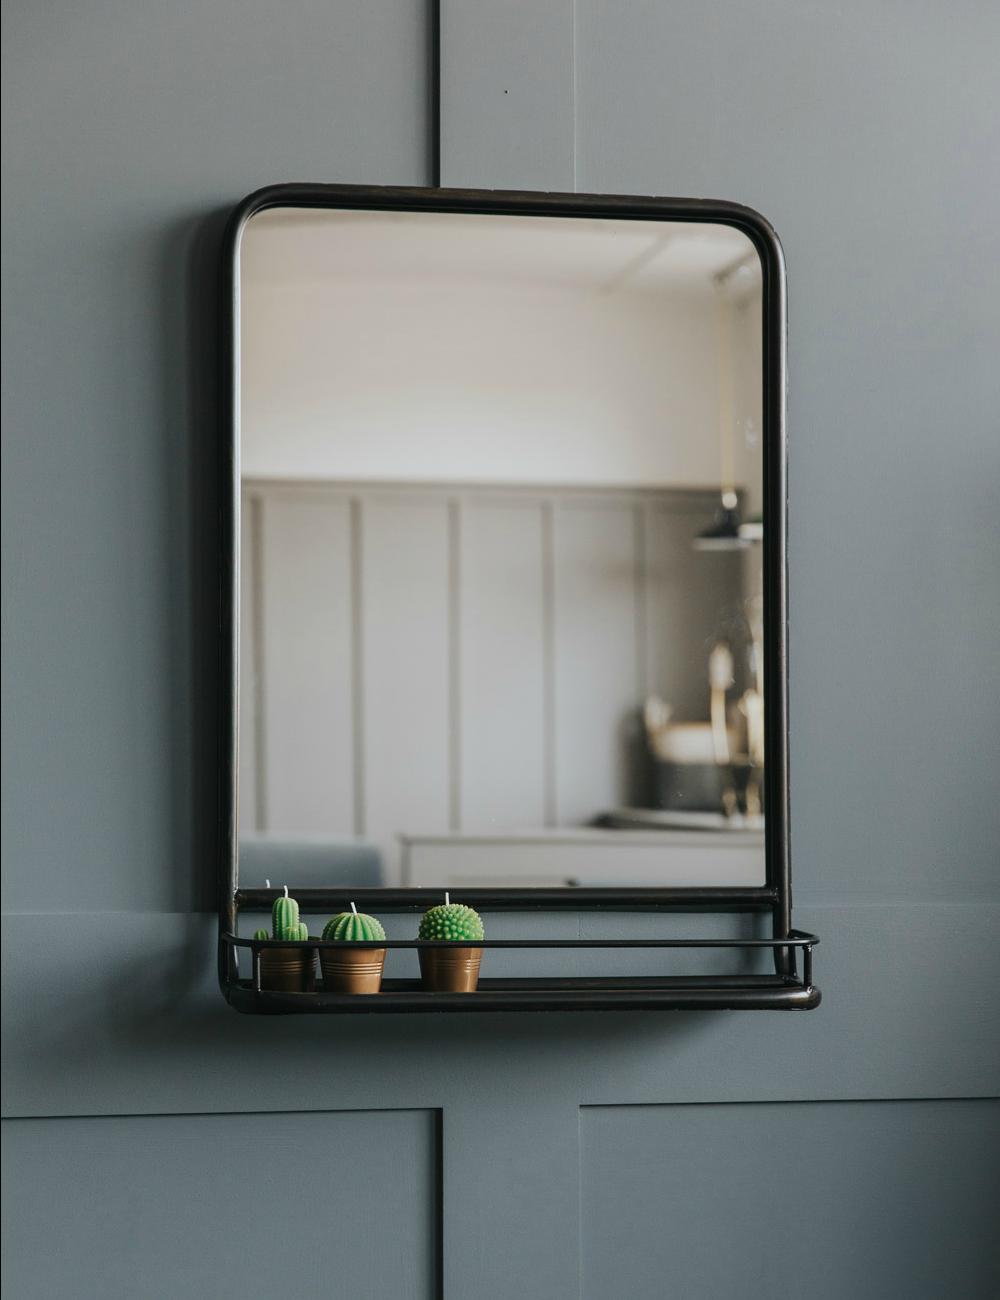 Bathroom mirror with shelf uk - Large Industrial Mirror With Shelf